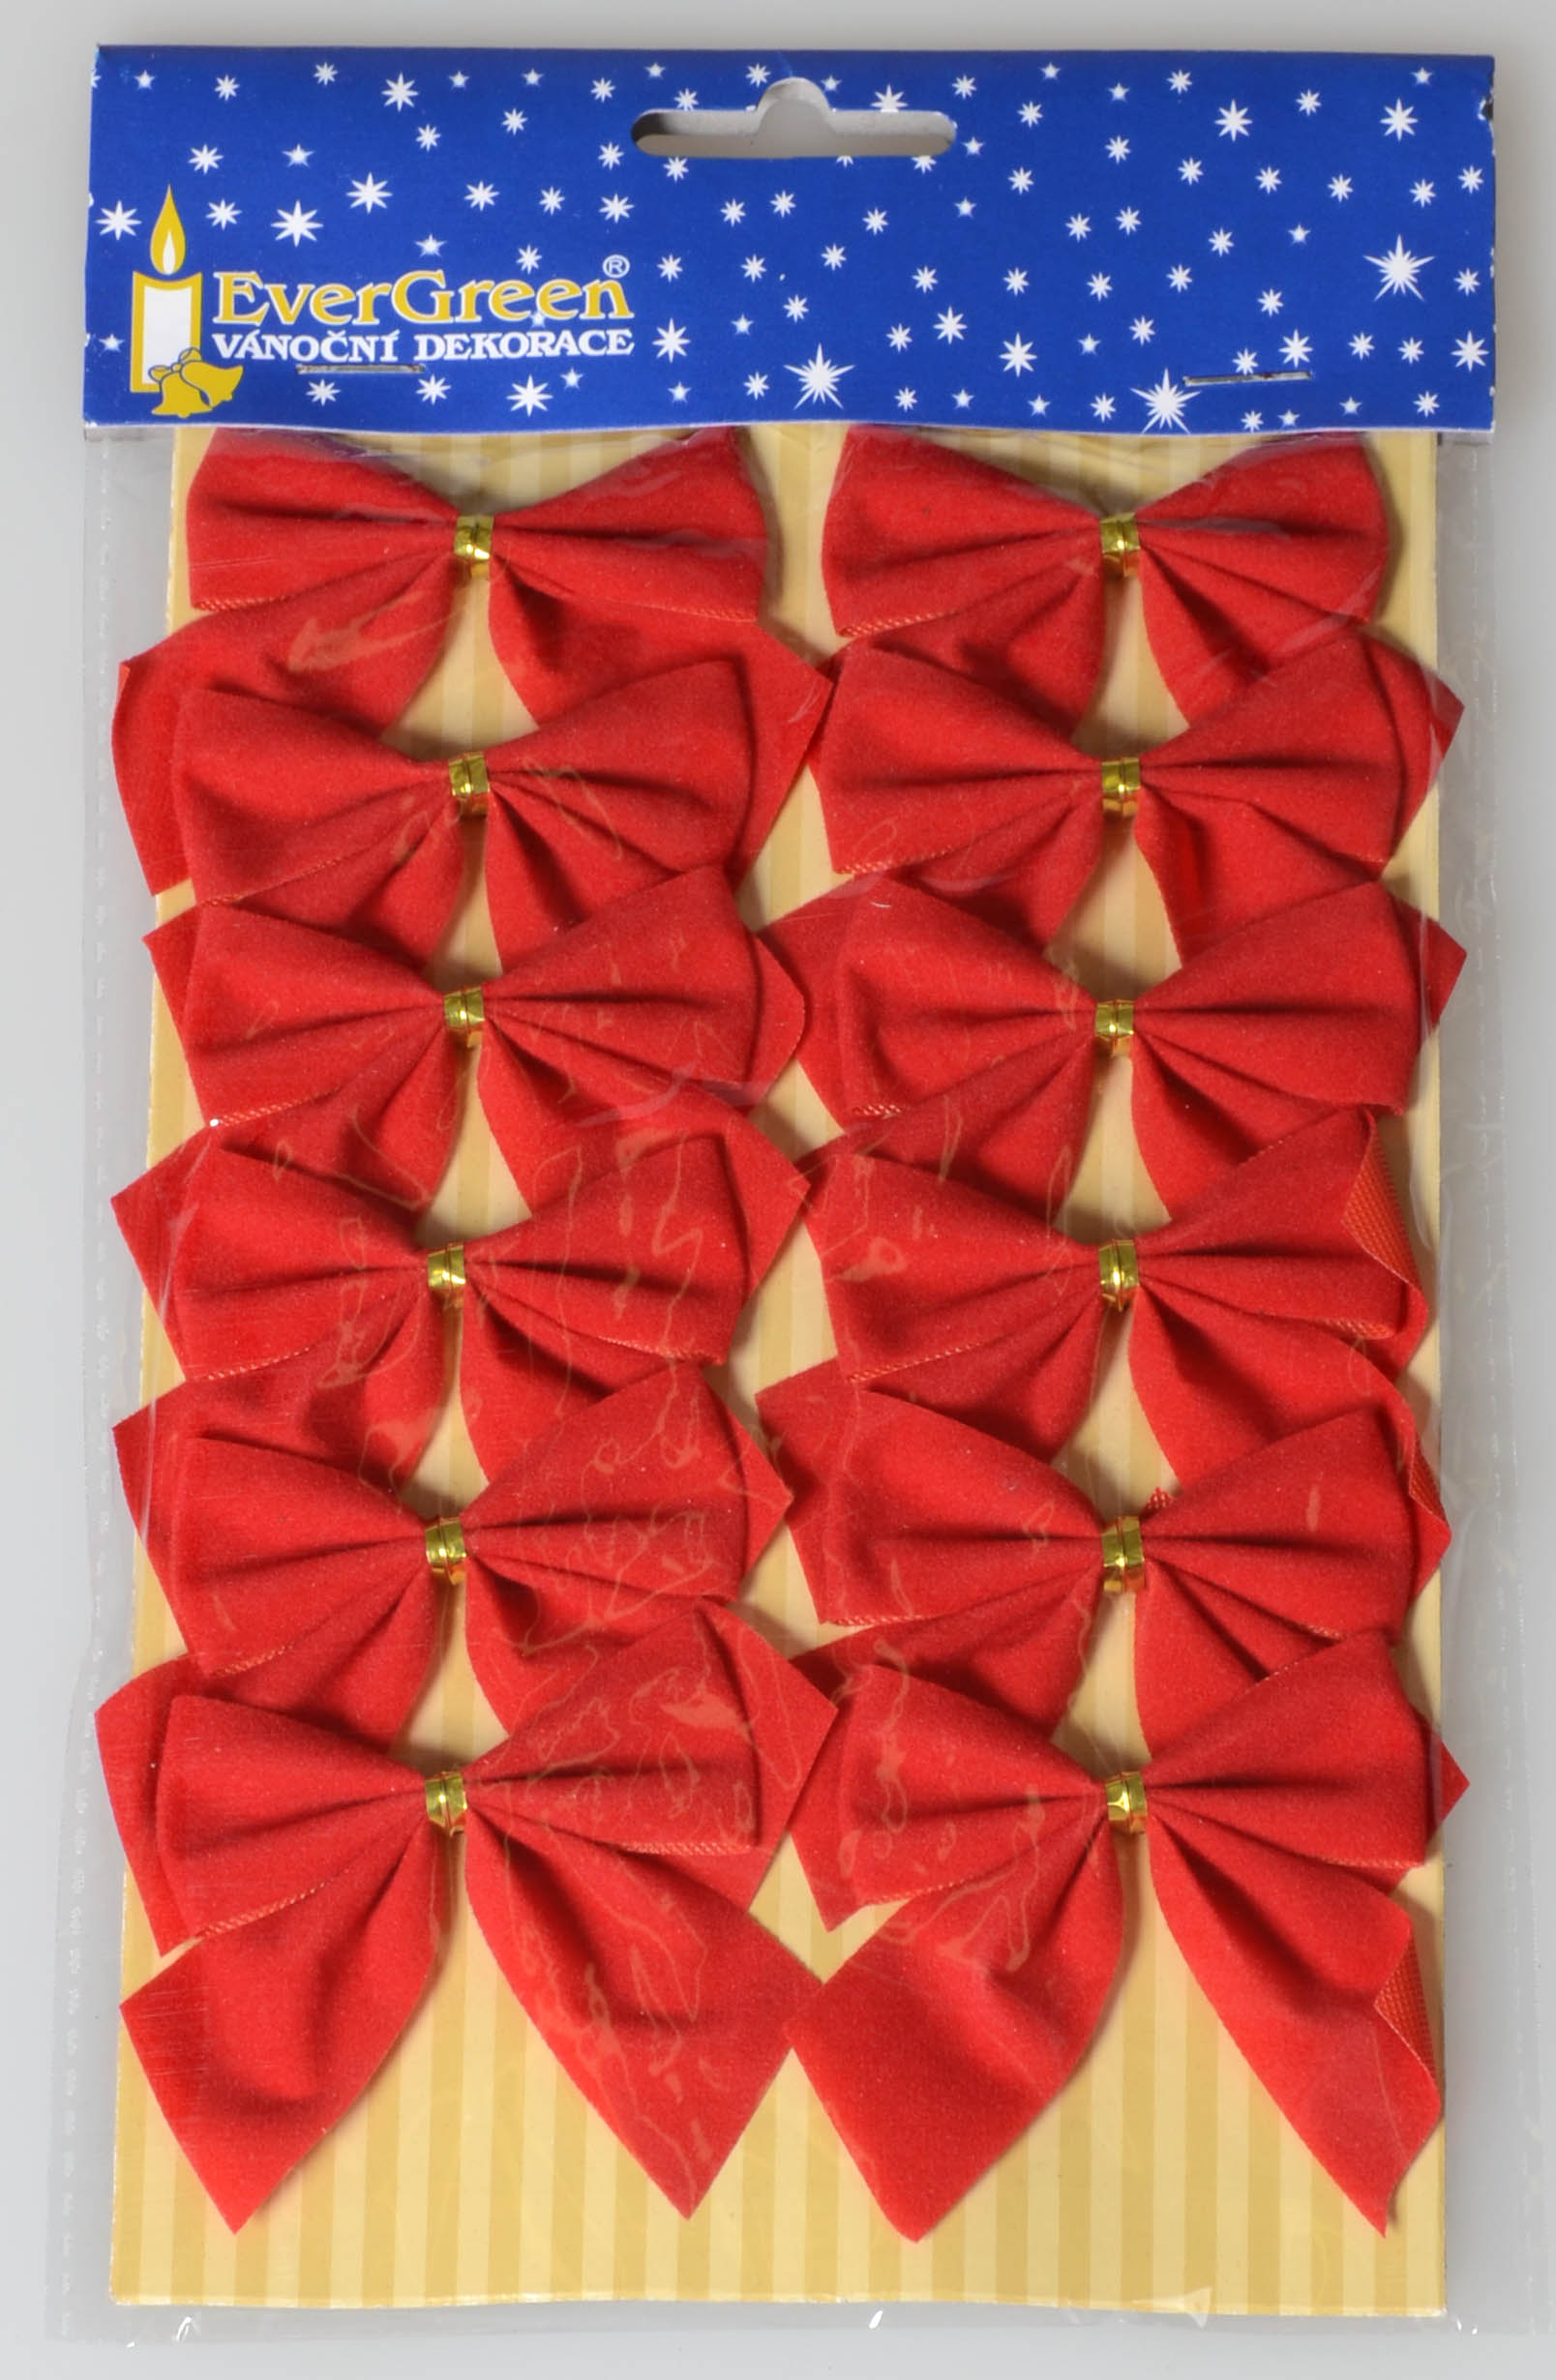 60-19 mašle červené sametové 12 ks 5,5x5,5 cm